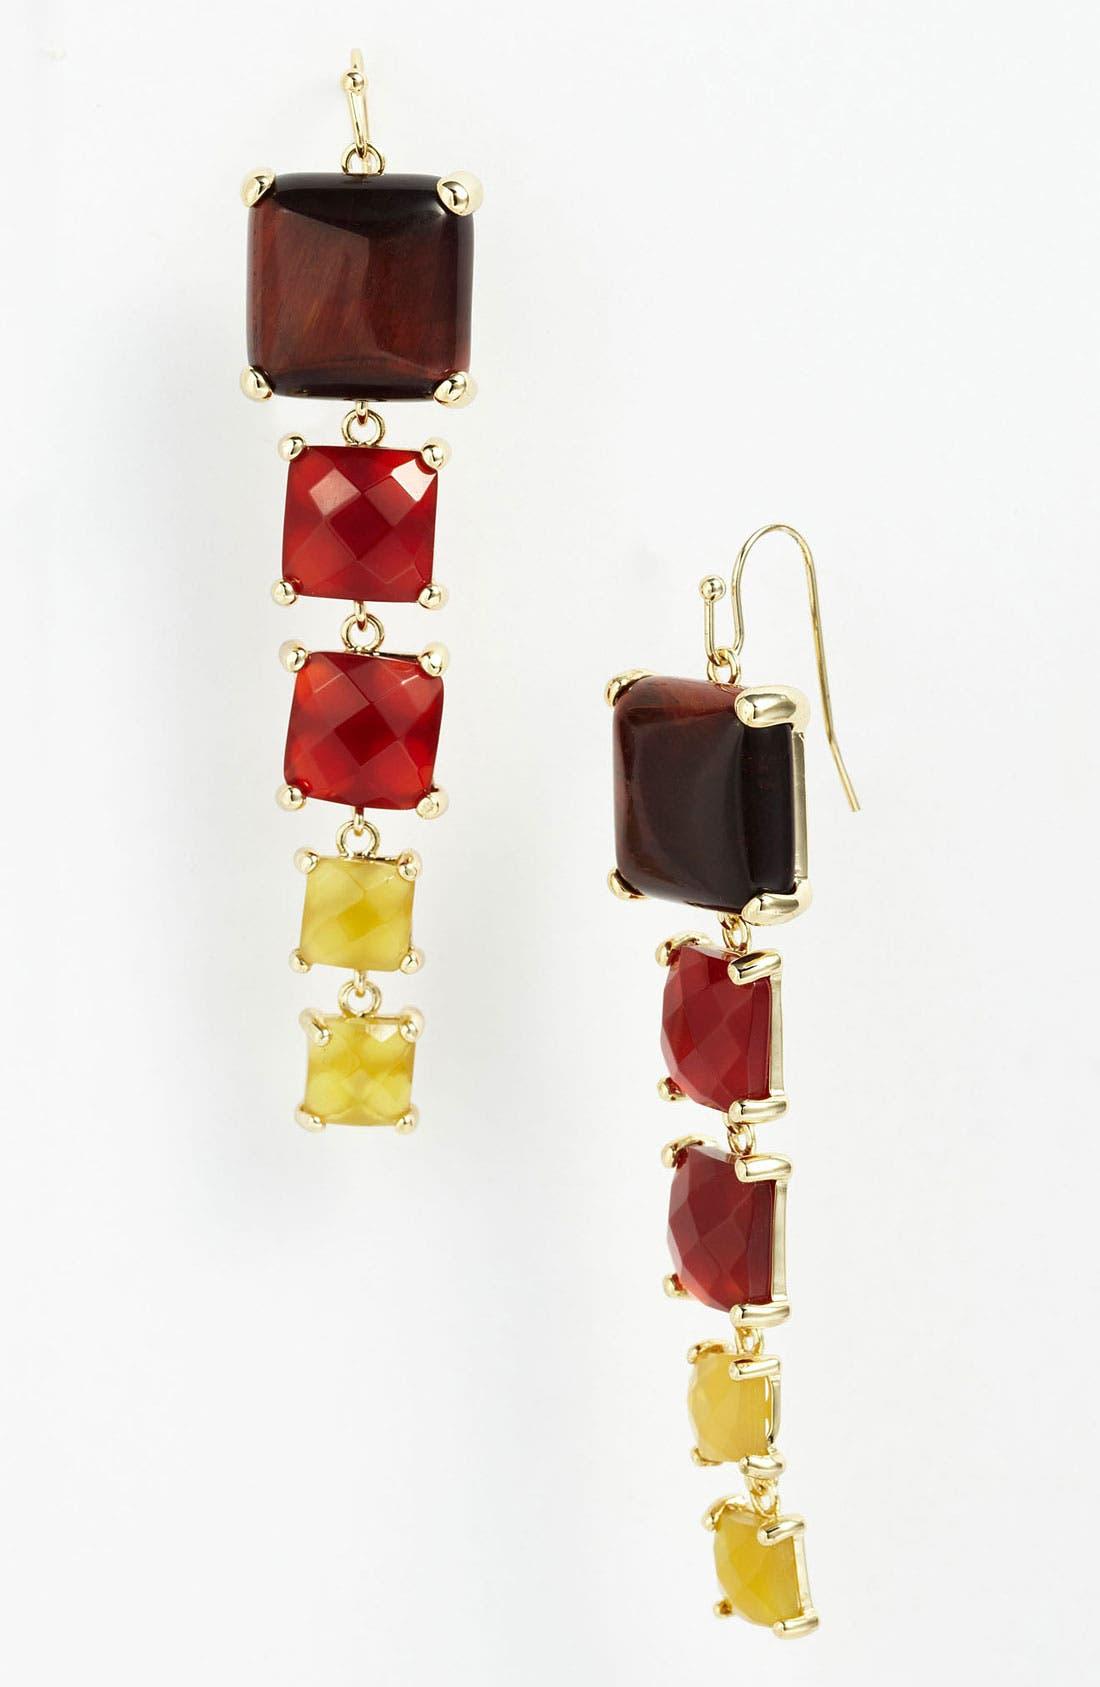 Alternate Image 1 Selected - Kendra Scott 'Lindy' Linear Earrings